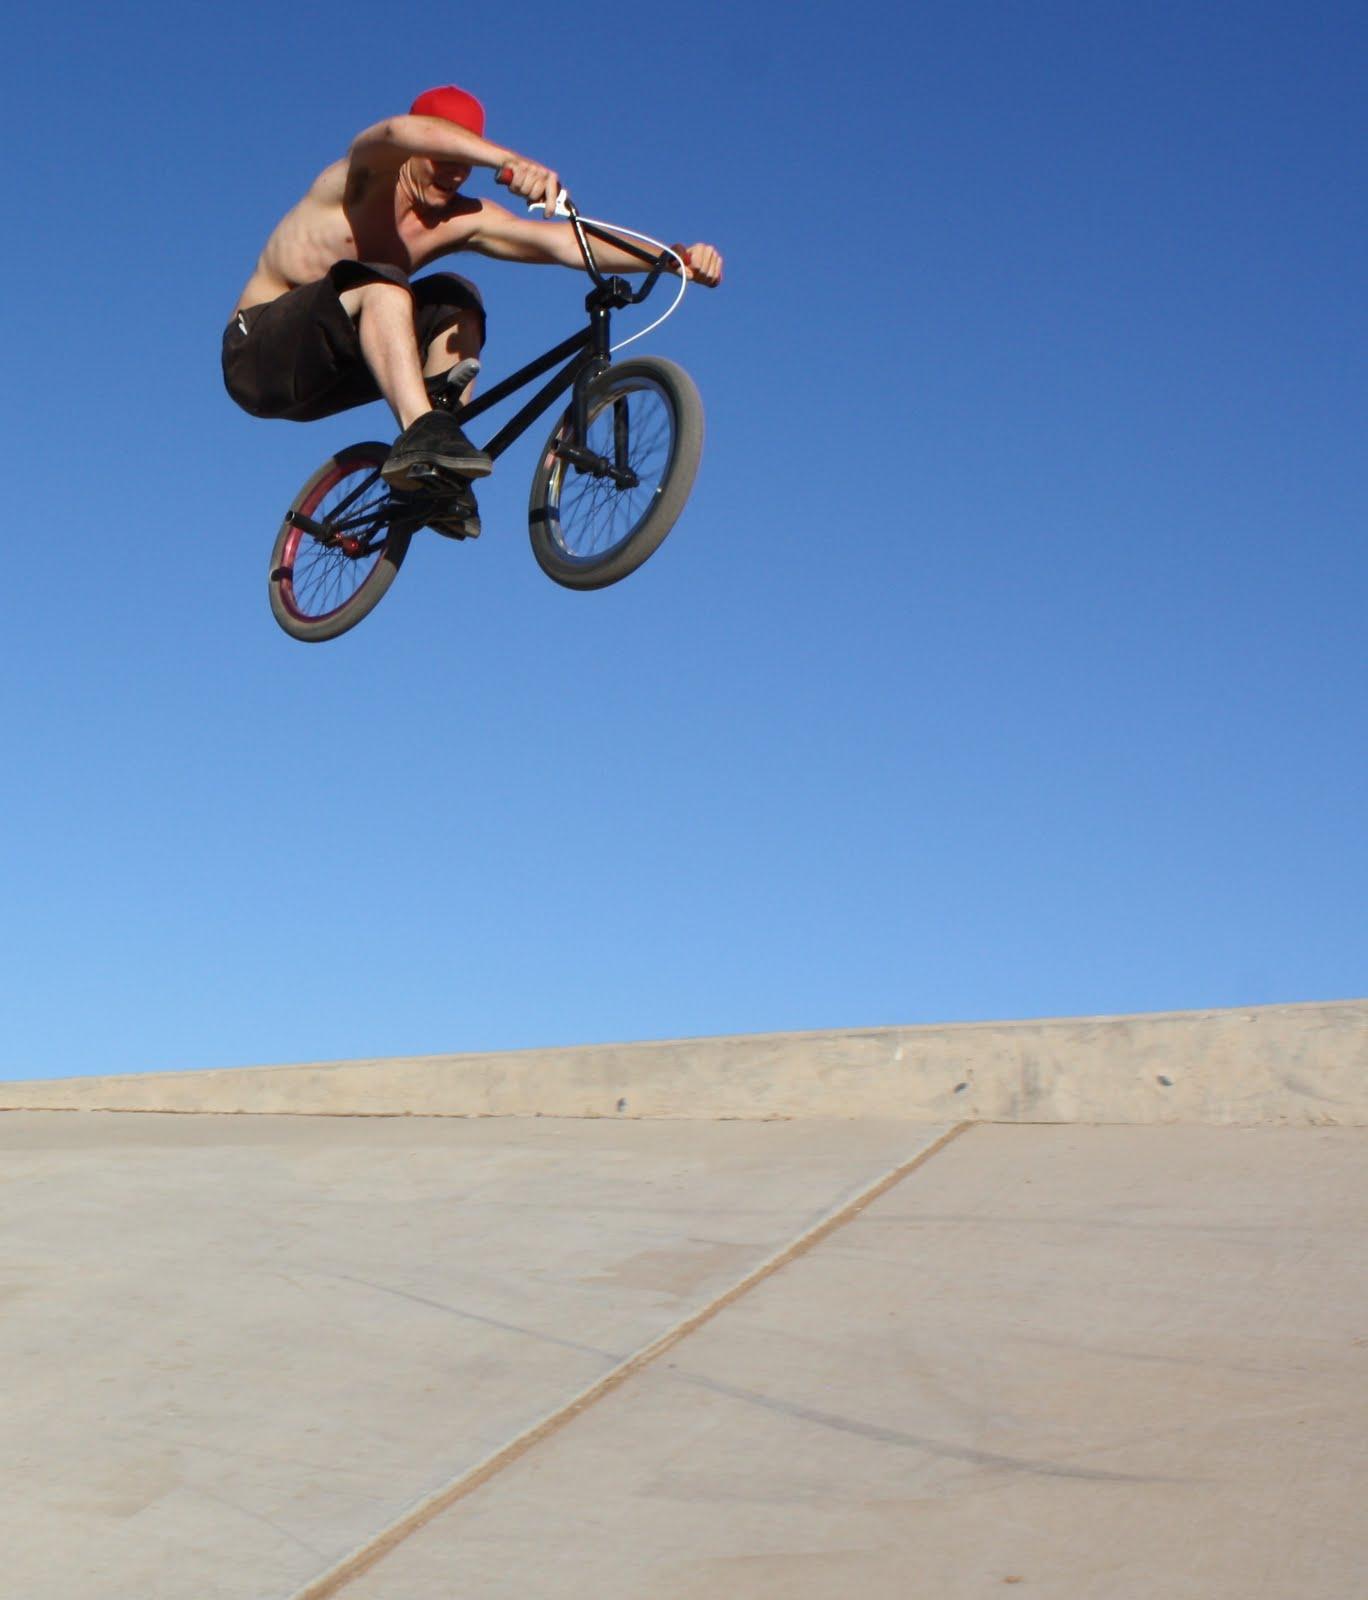 bmx tricks bmx - photo #7